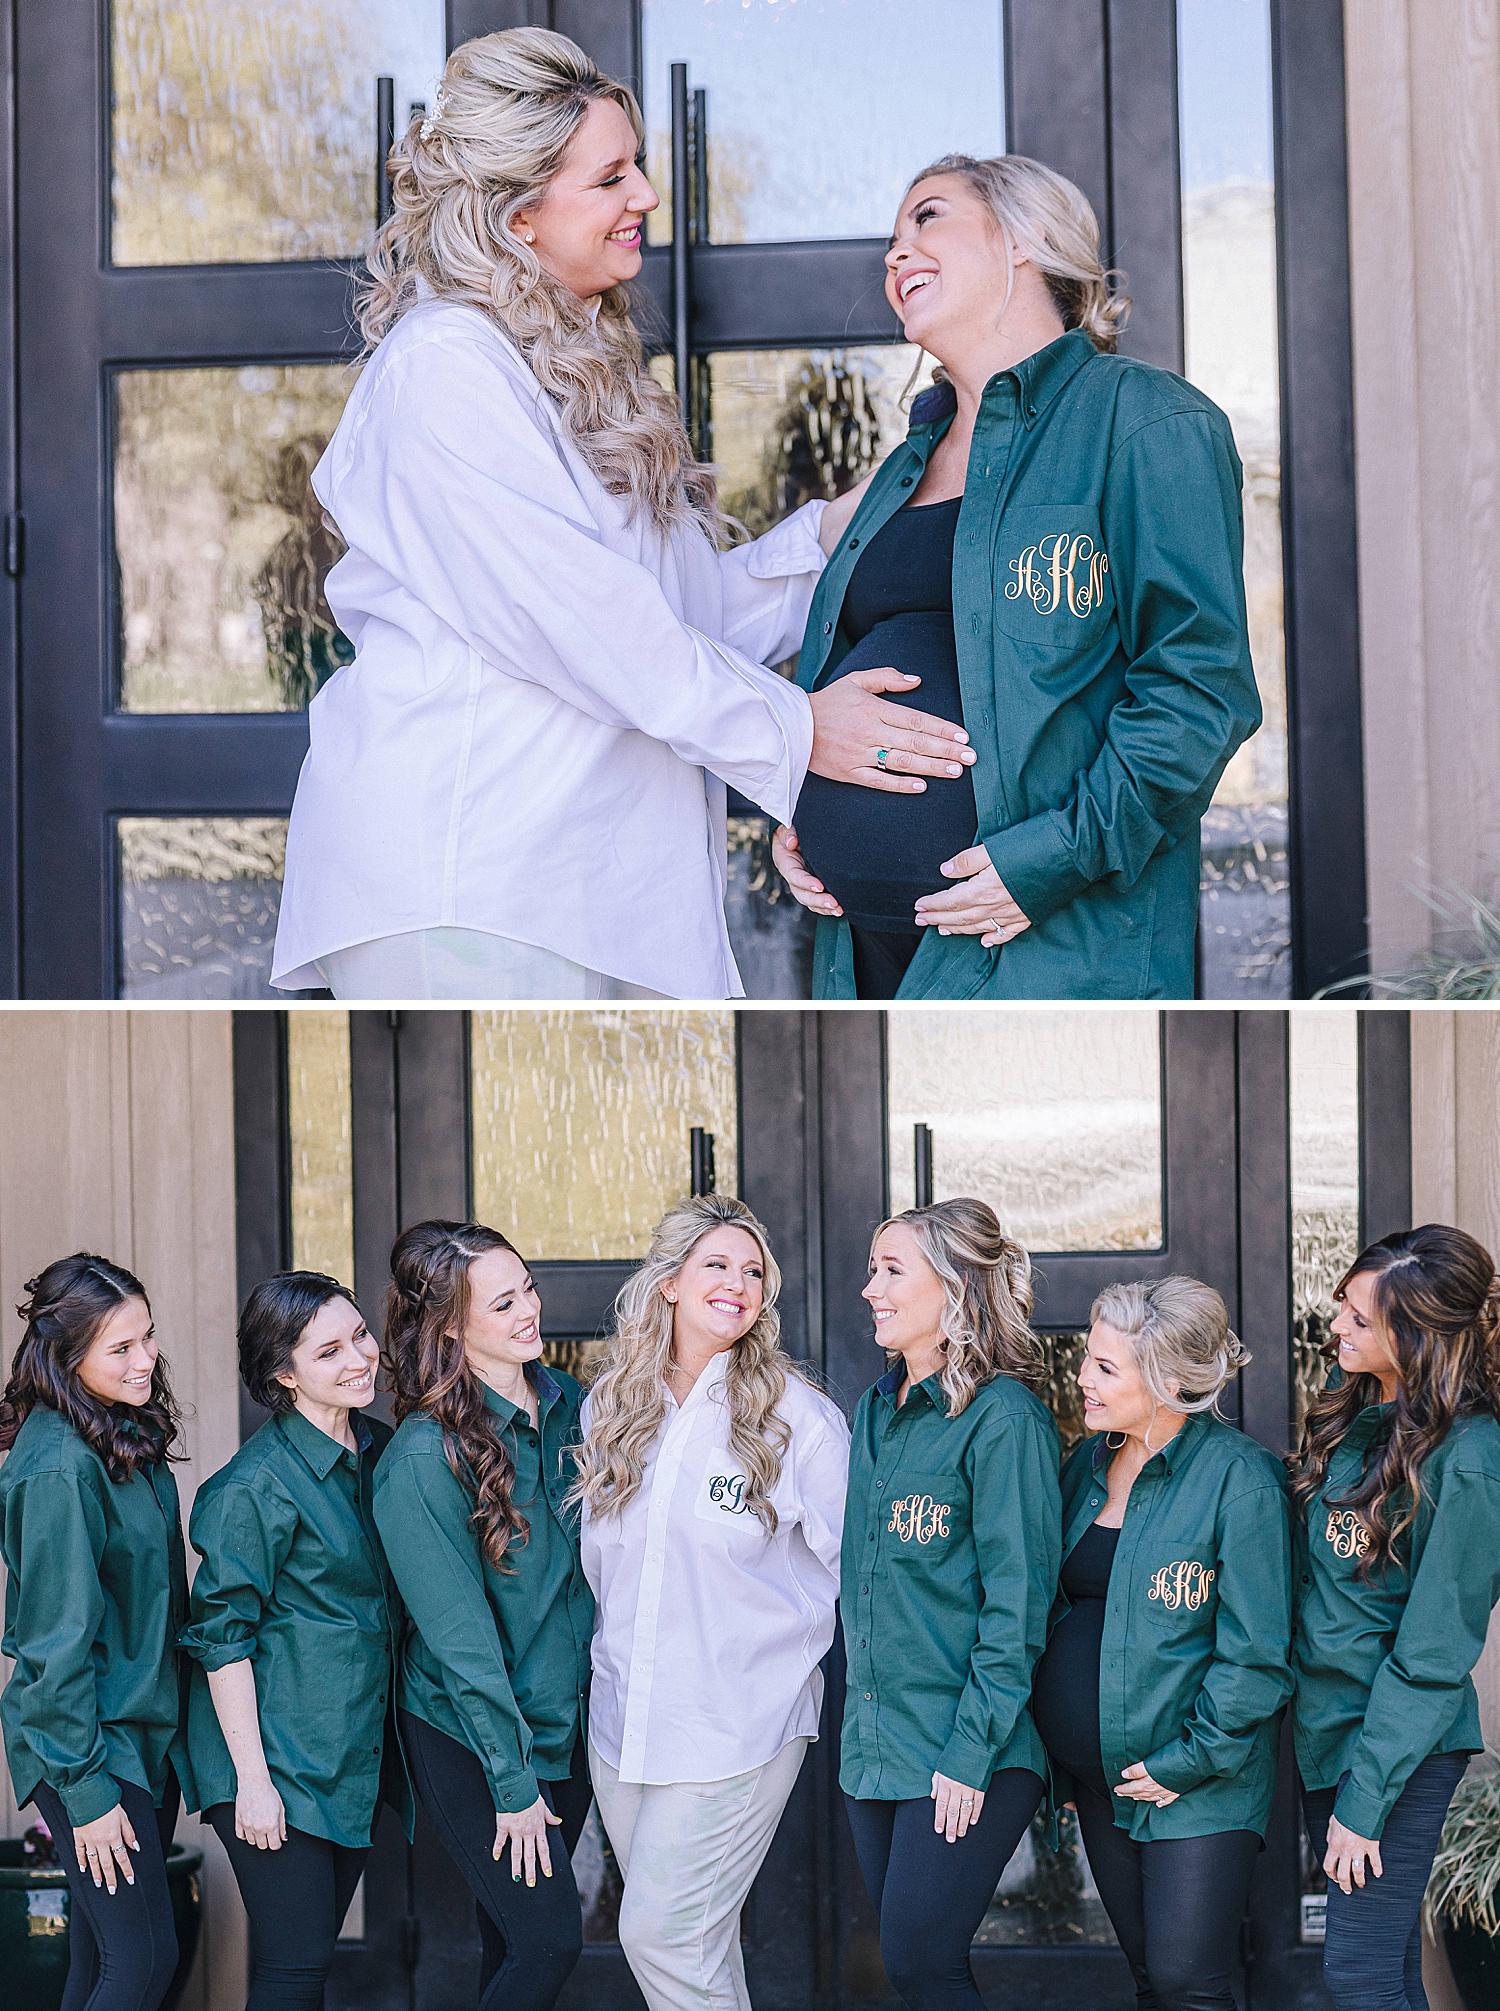 Magnolia-Halle-Wedding-San-Antonio-Texas-Bride-Grom_0025.jpg